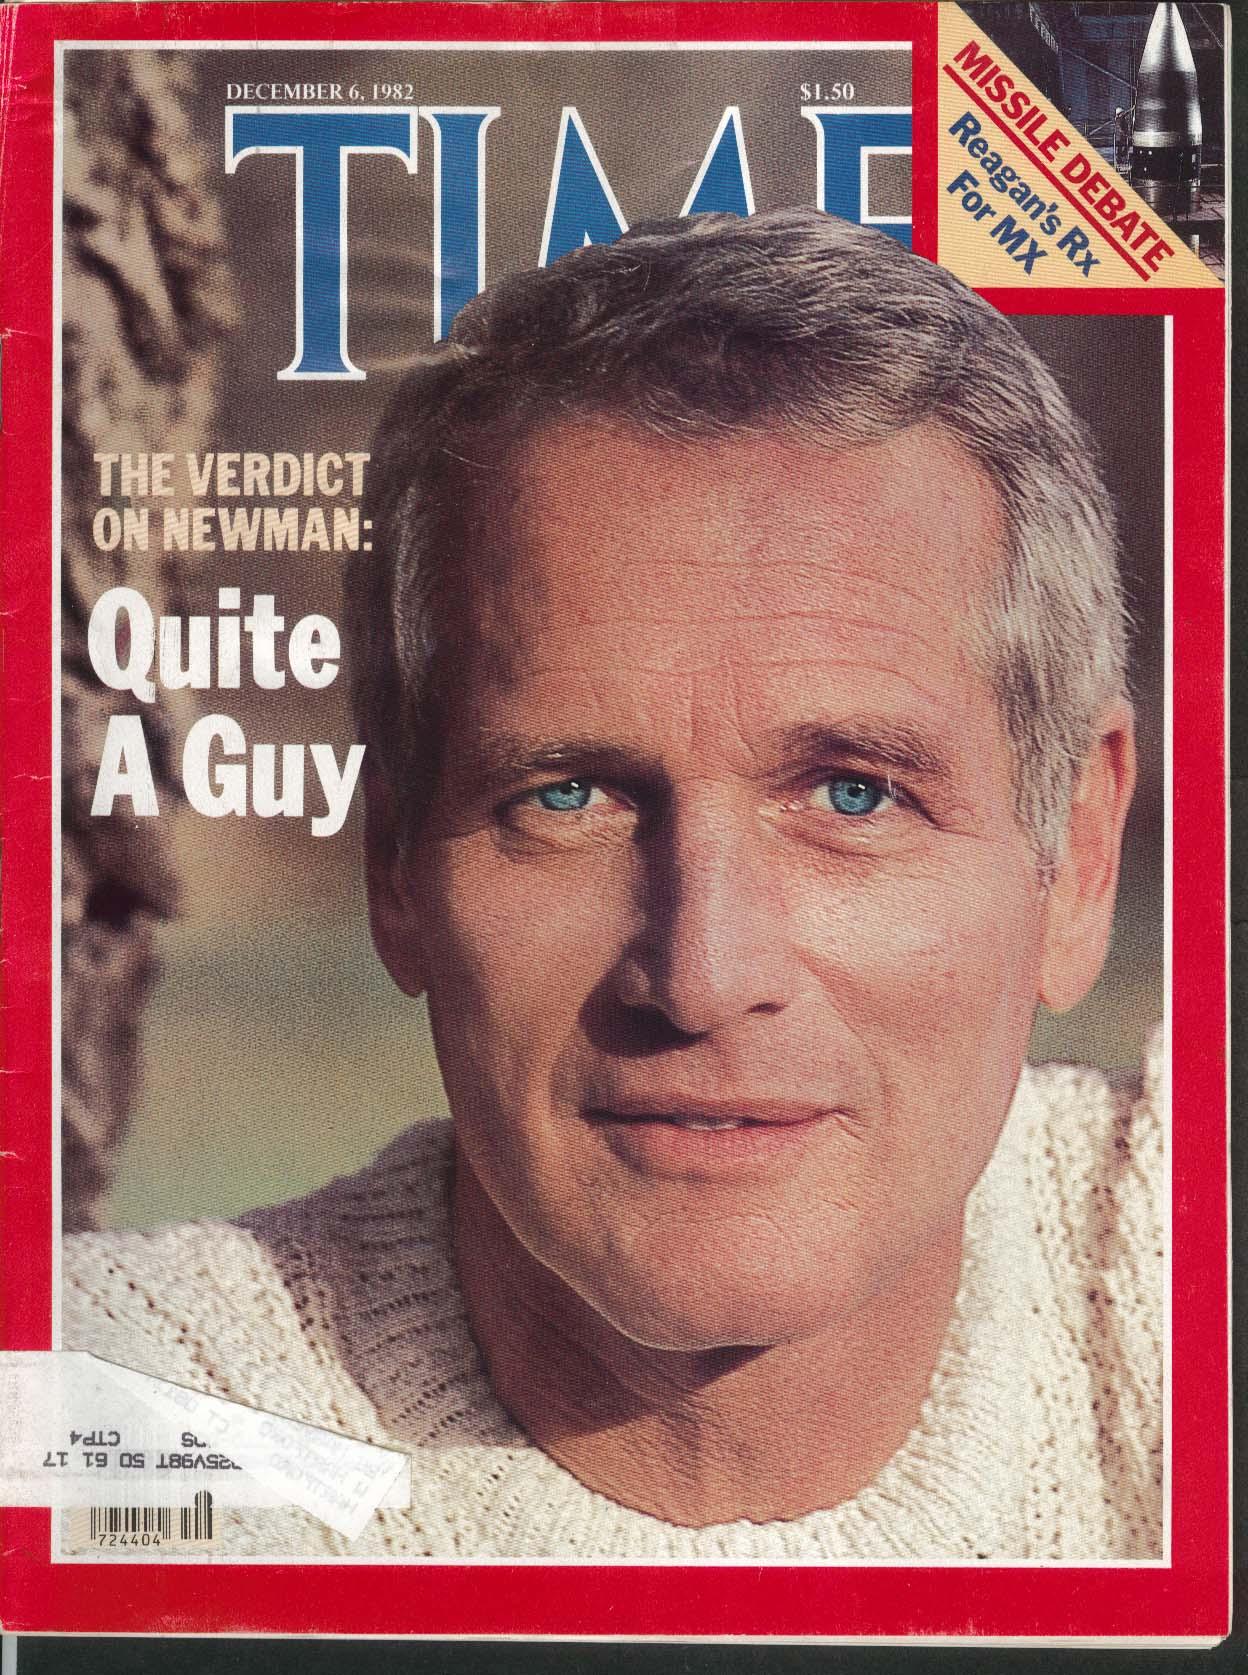 TIME Paul Newman Reagan MX Missiles Andropov Ben Kingsley Gandhi 12/6 1982